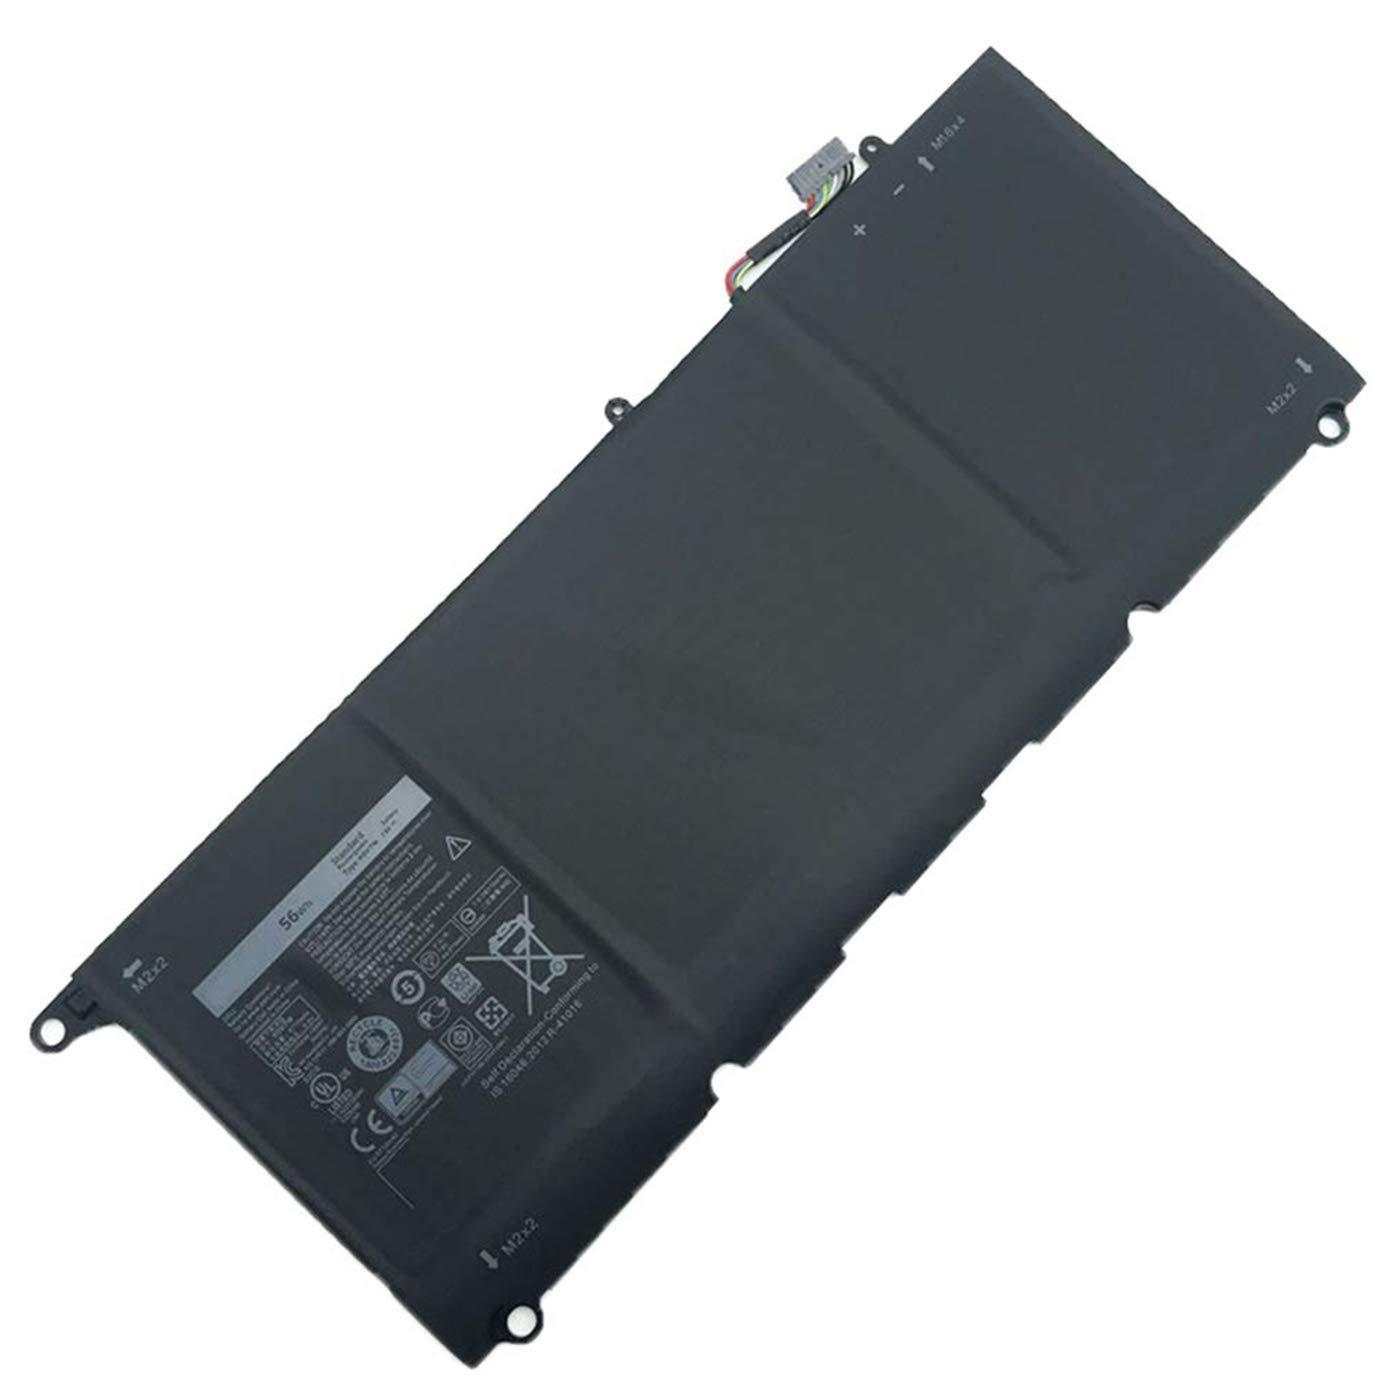 Bateria Dell 90V7W 7.6V 56Wh 7435mAh XPS 13 9343 9350 Series